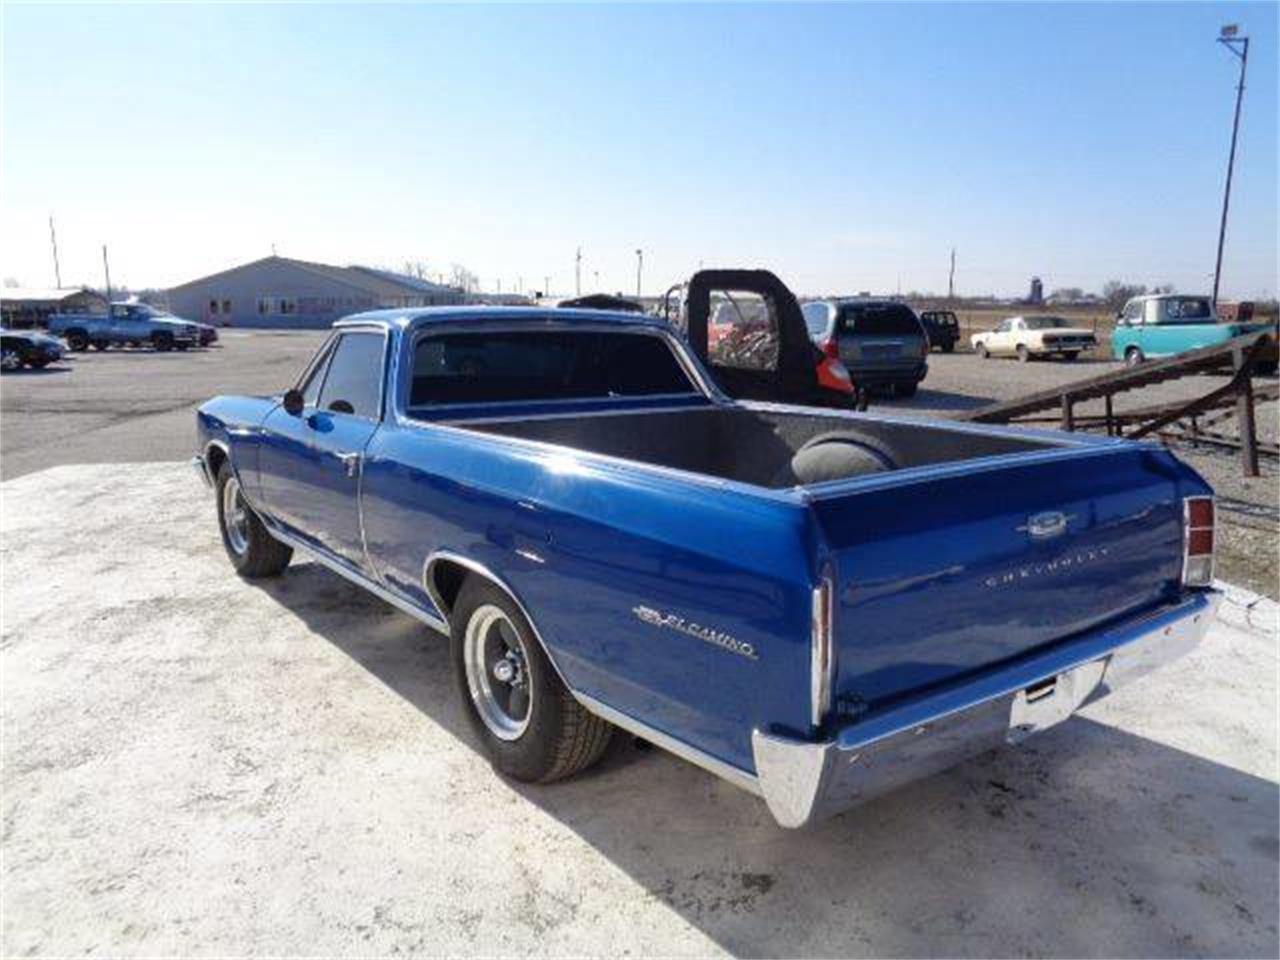 1966 Chevrolet El Camino (CC-1075804) for sale in Staunton, Illinois